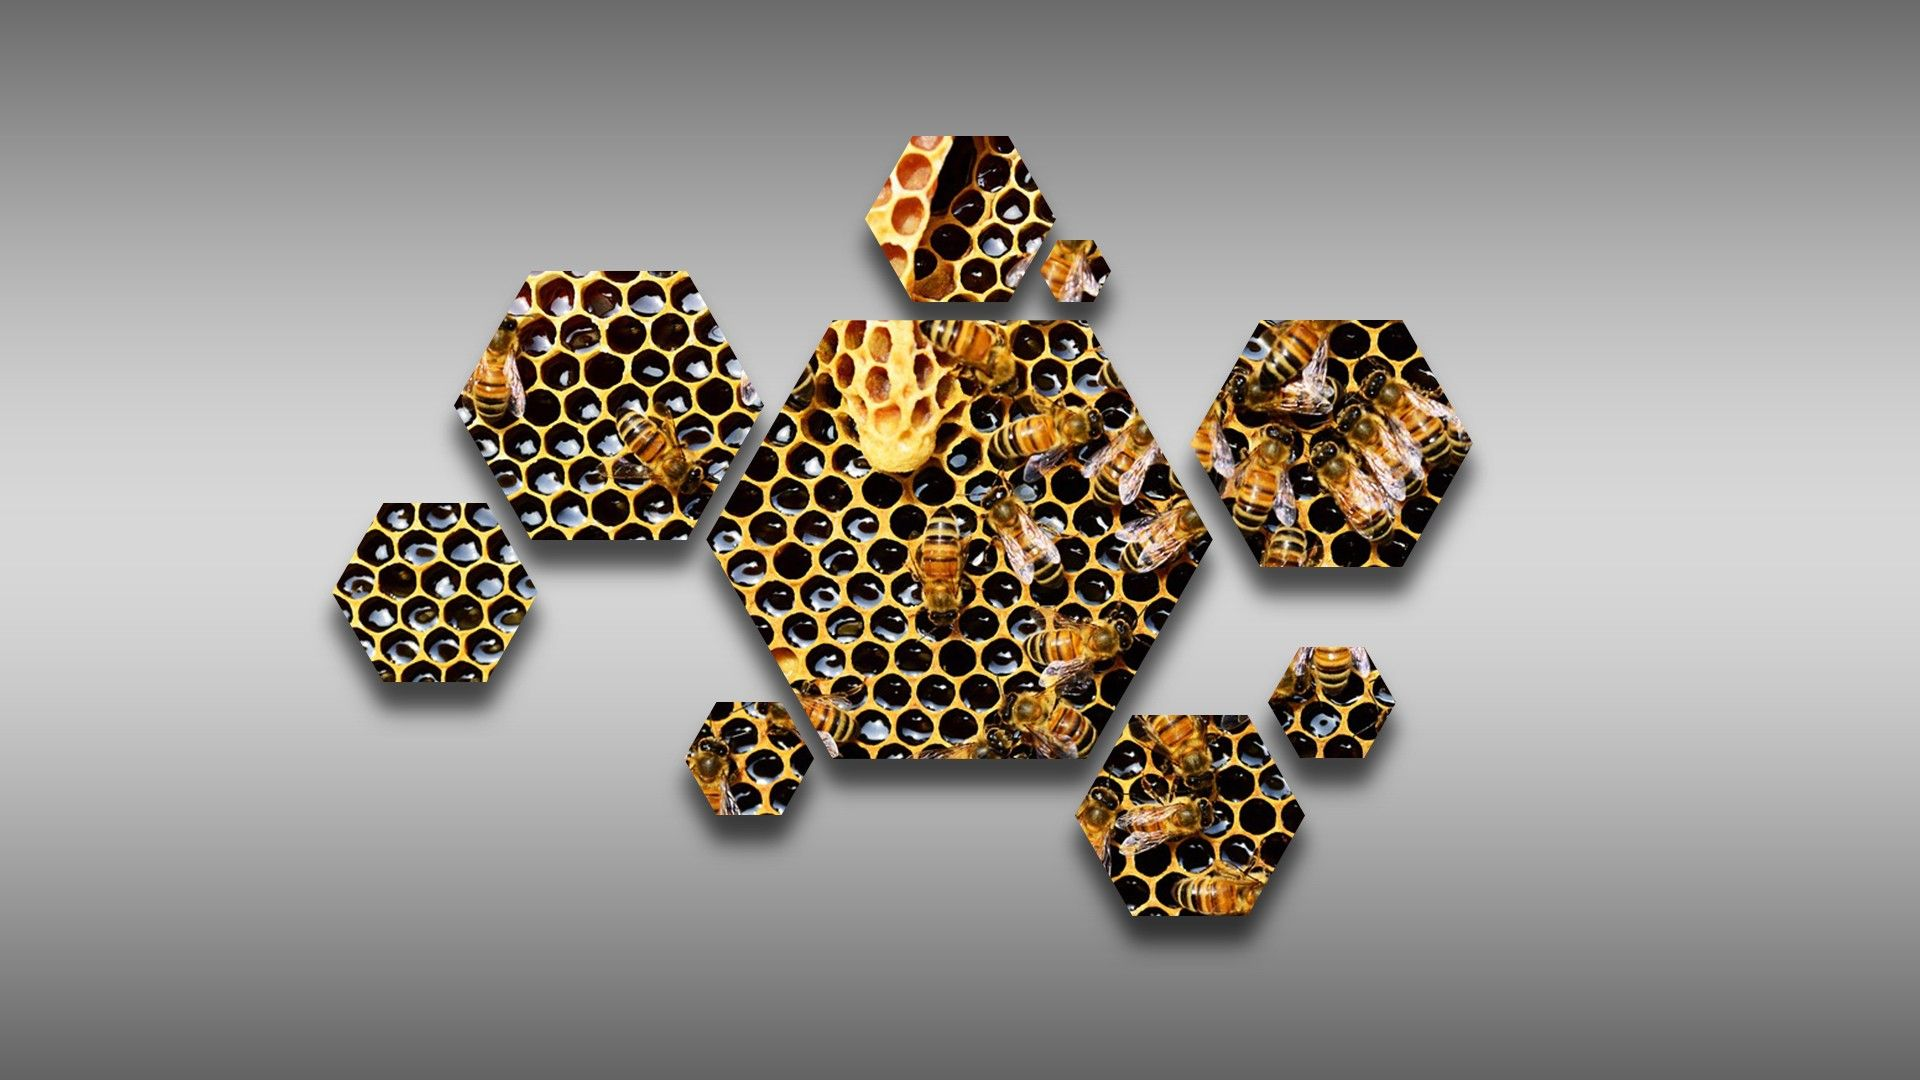 photos of honey bees